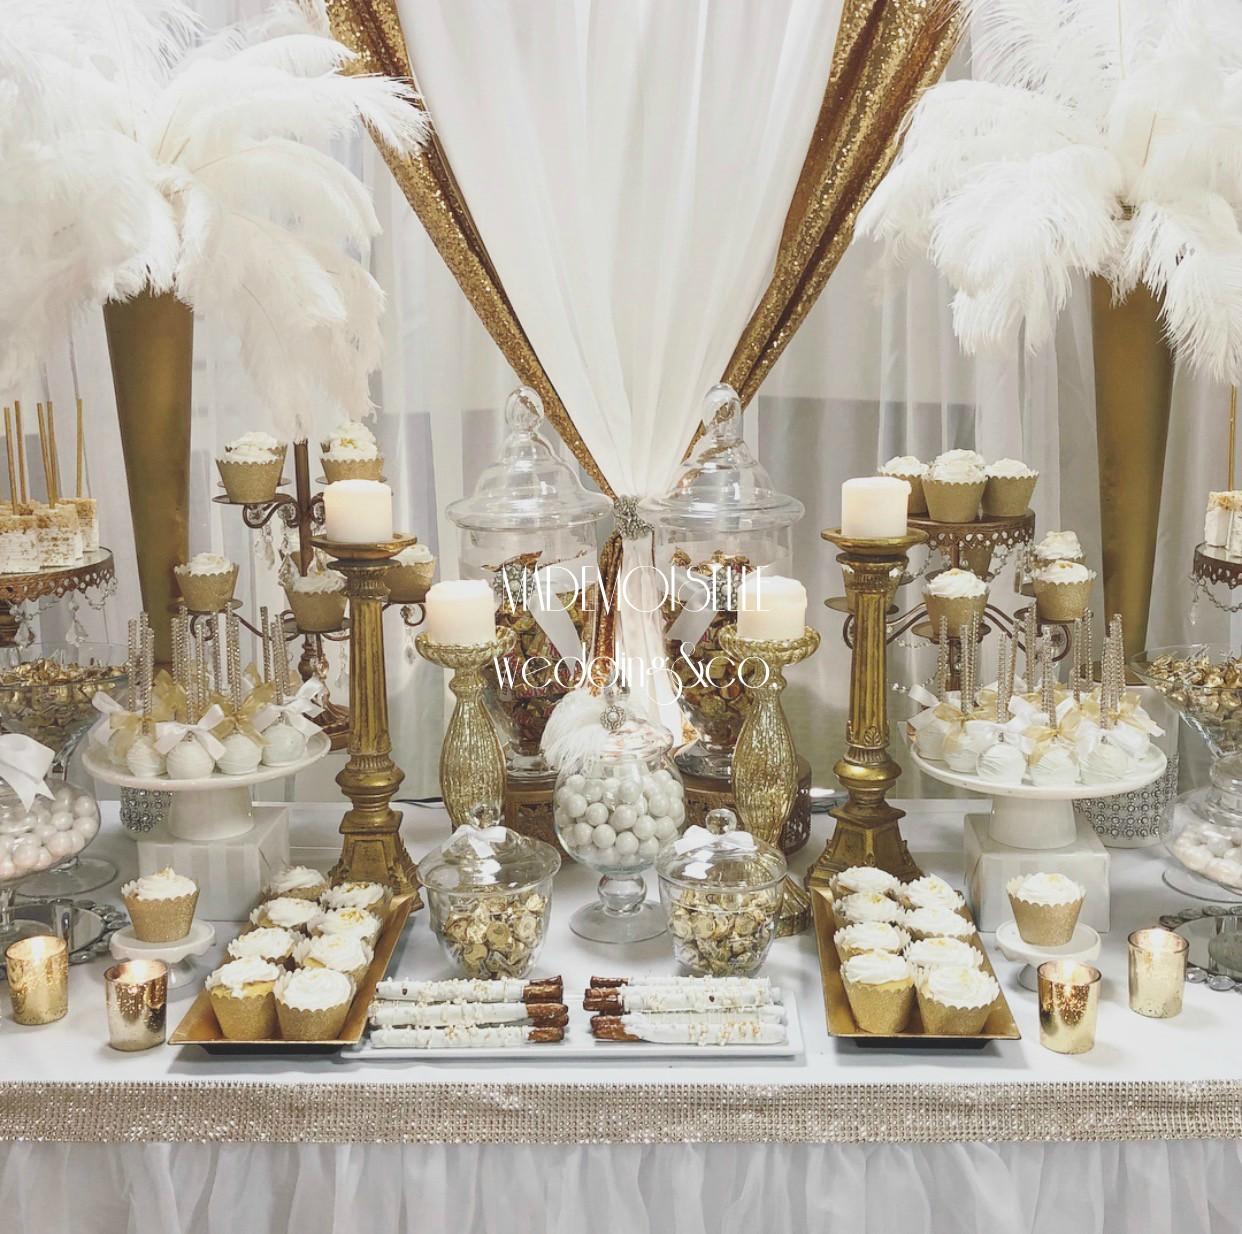 Slatki sto-dekoracija za slatki sto-dekoracija slatkog stola-kolaci-cupecakes-zlatna dekoracija slatkog stola-muffins-cakepops-perje-belo perje-dekoracija belim perjem-dekoracija rodjendana